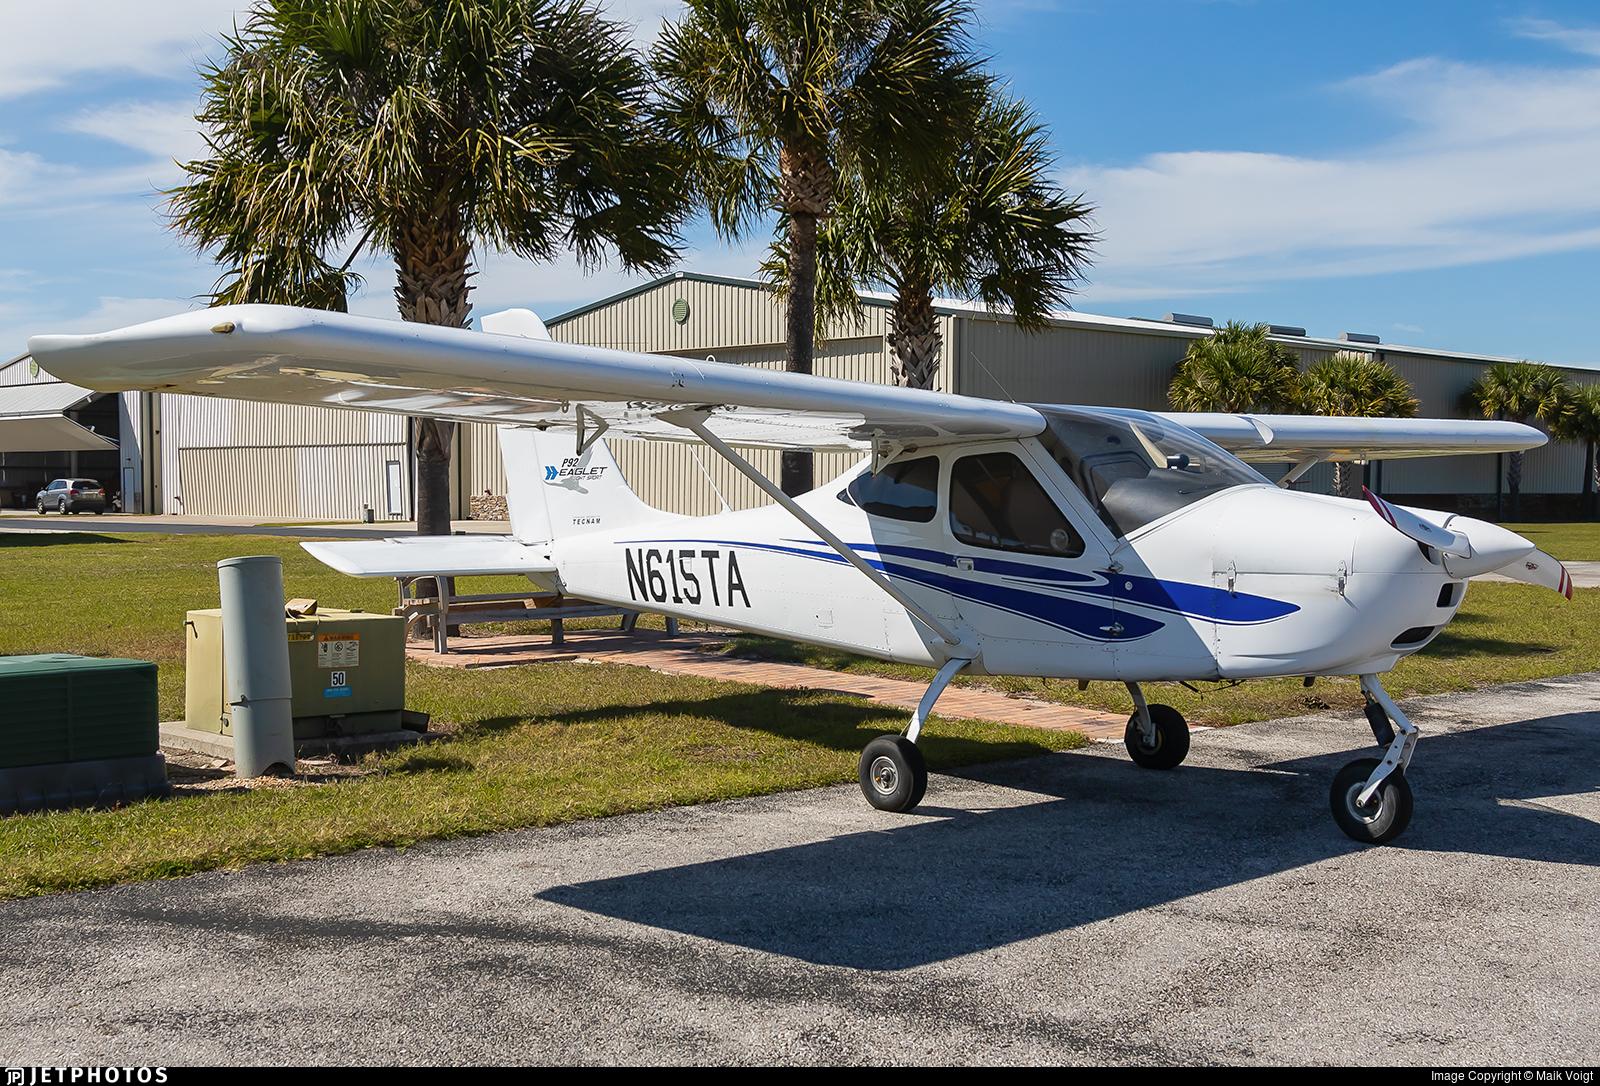 N615TA - Tecnam P92 Eaglet Light Sport - Costruzioni Aeronautiche Tecnam